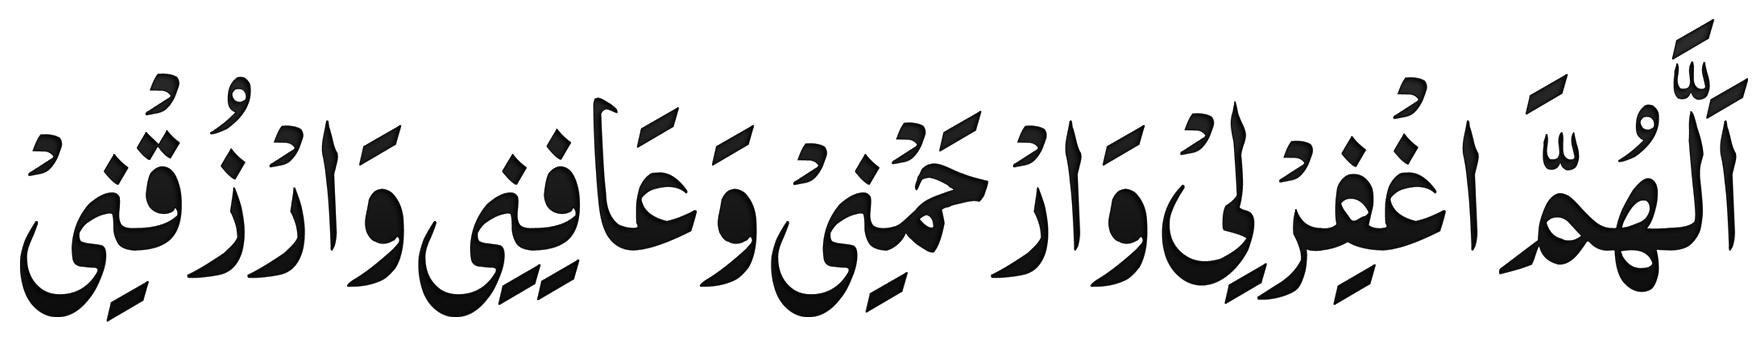 rizq-ki-dua-arabi